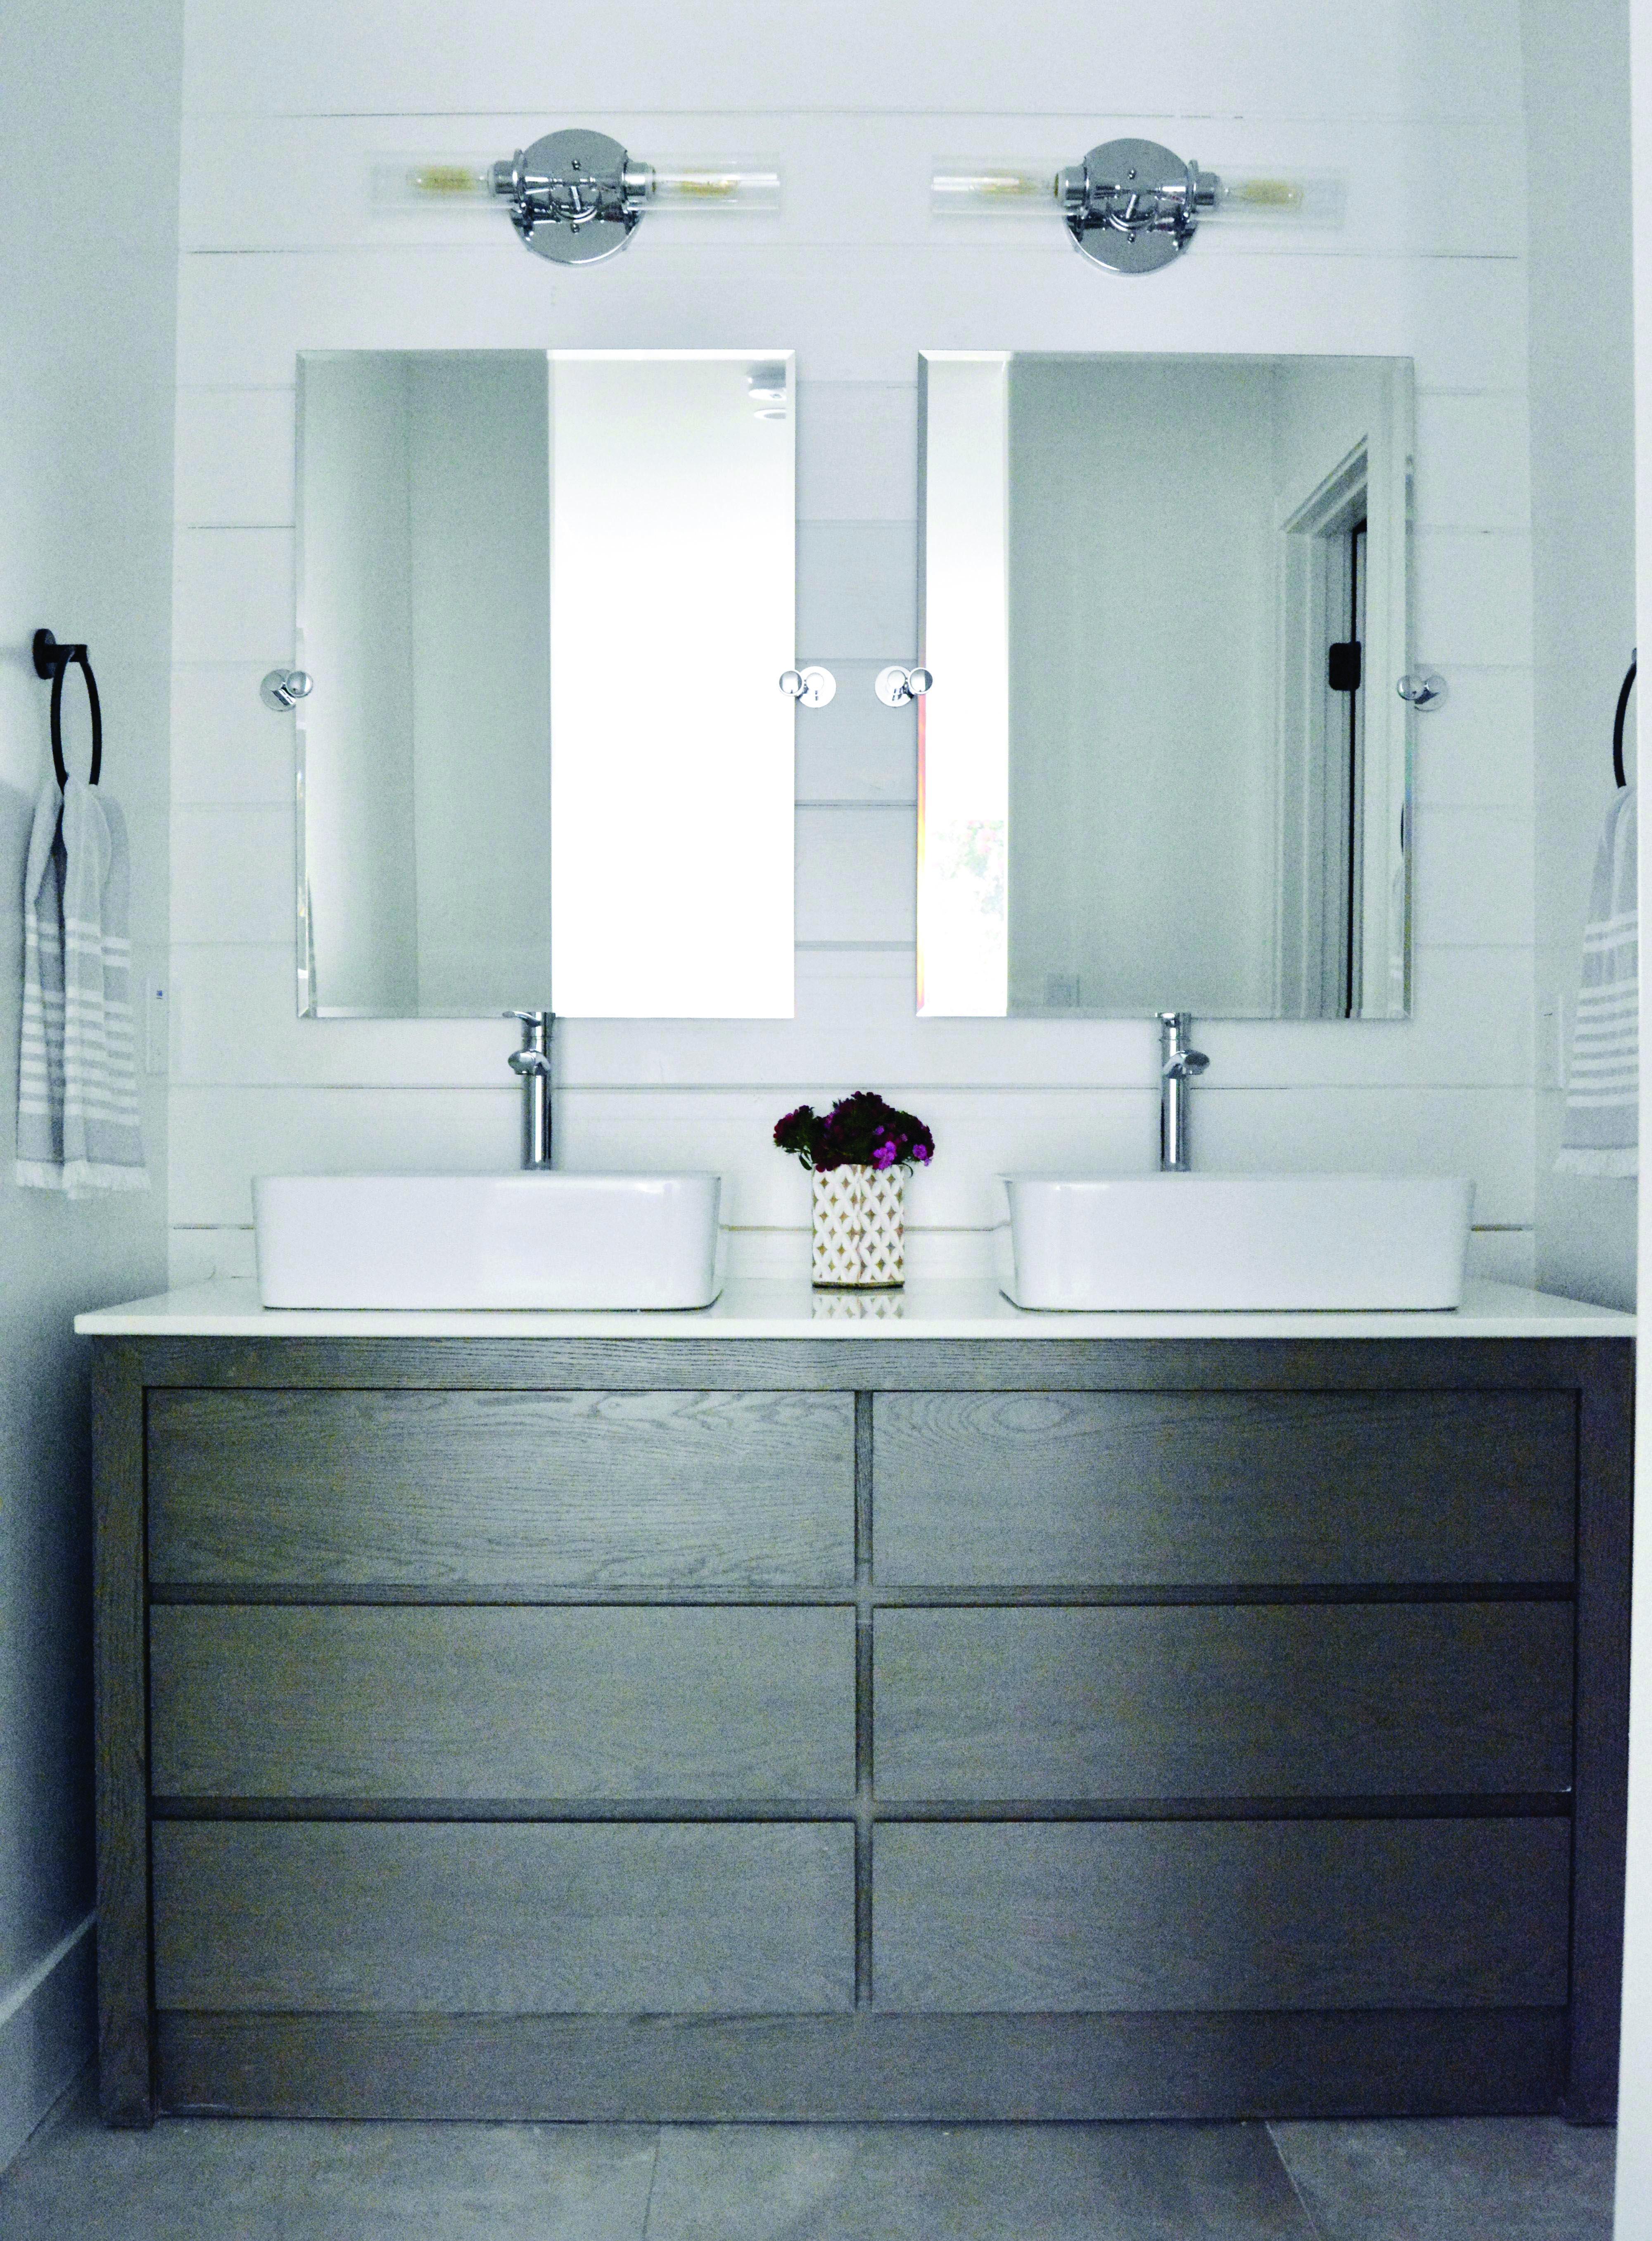 Awesome Shiplap Bathroom Lowes Just On Mafahomes Com